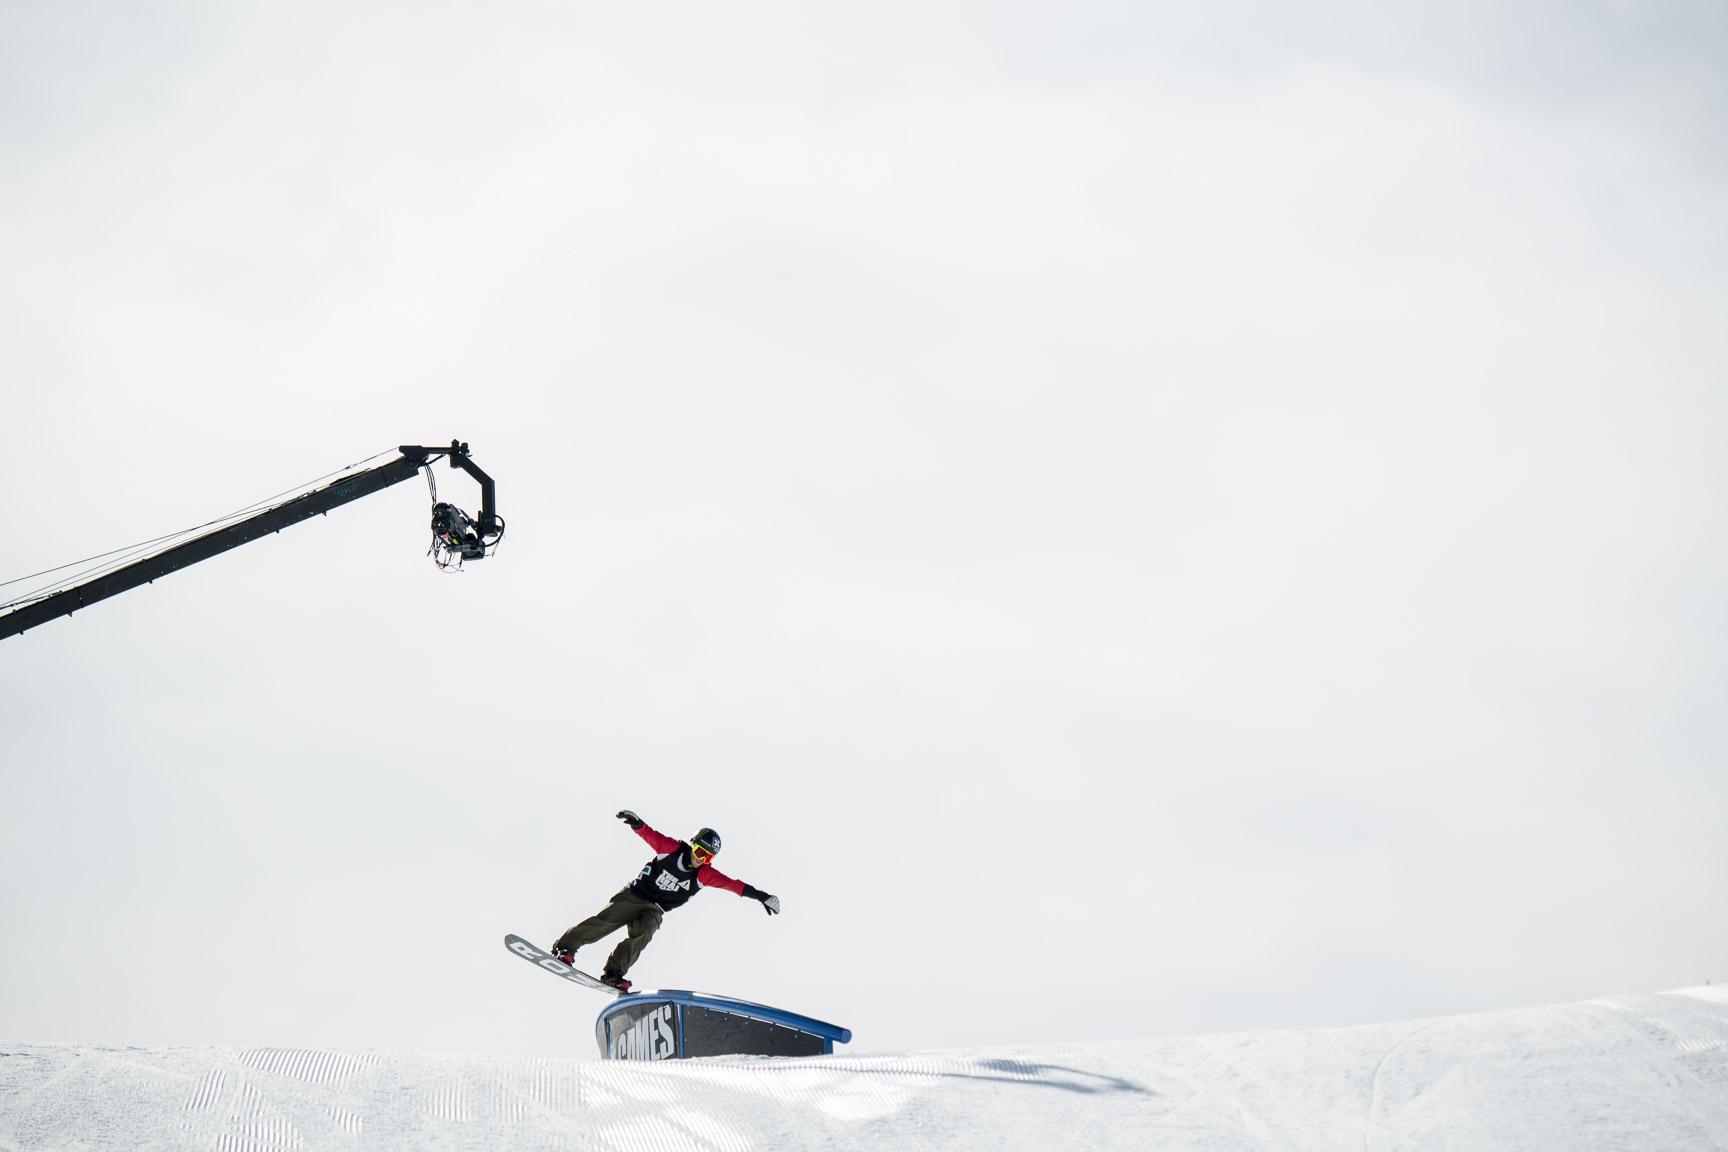 Ståle Sandbech, Snowboard Slopestyle Qualifier